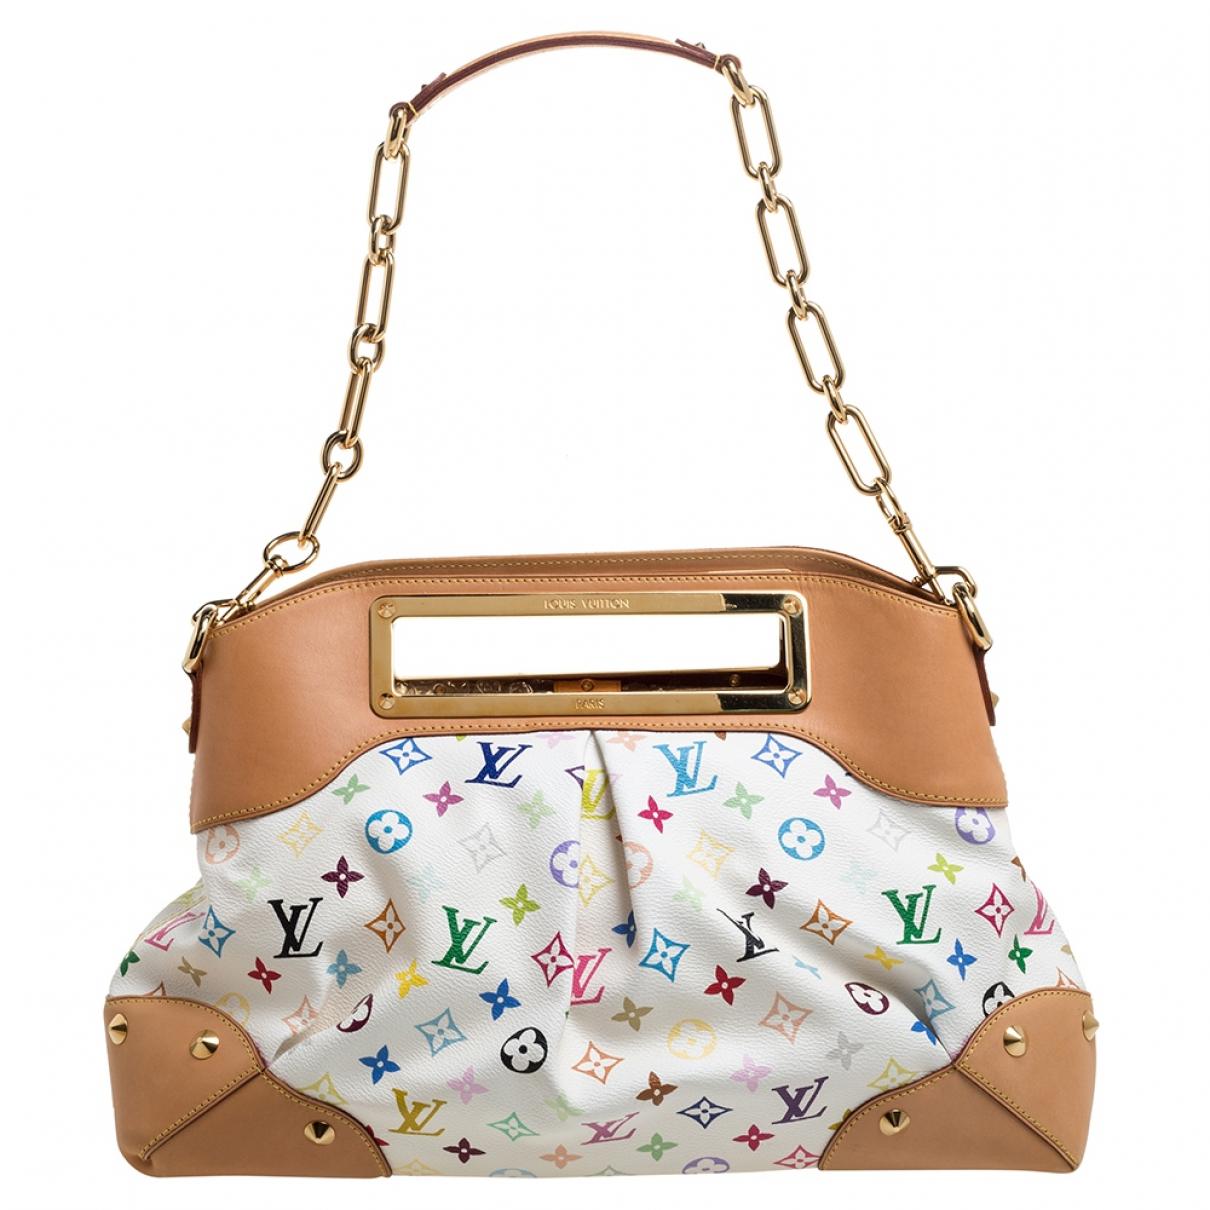 Louis Vuitton - Sac a main Judy pour femme en toile - blanc